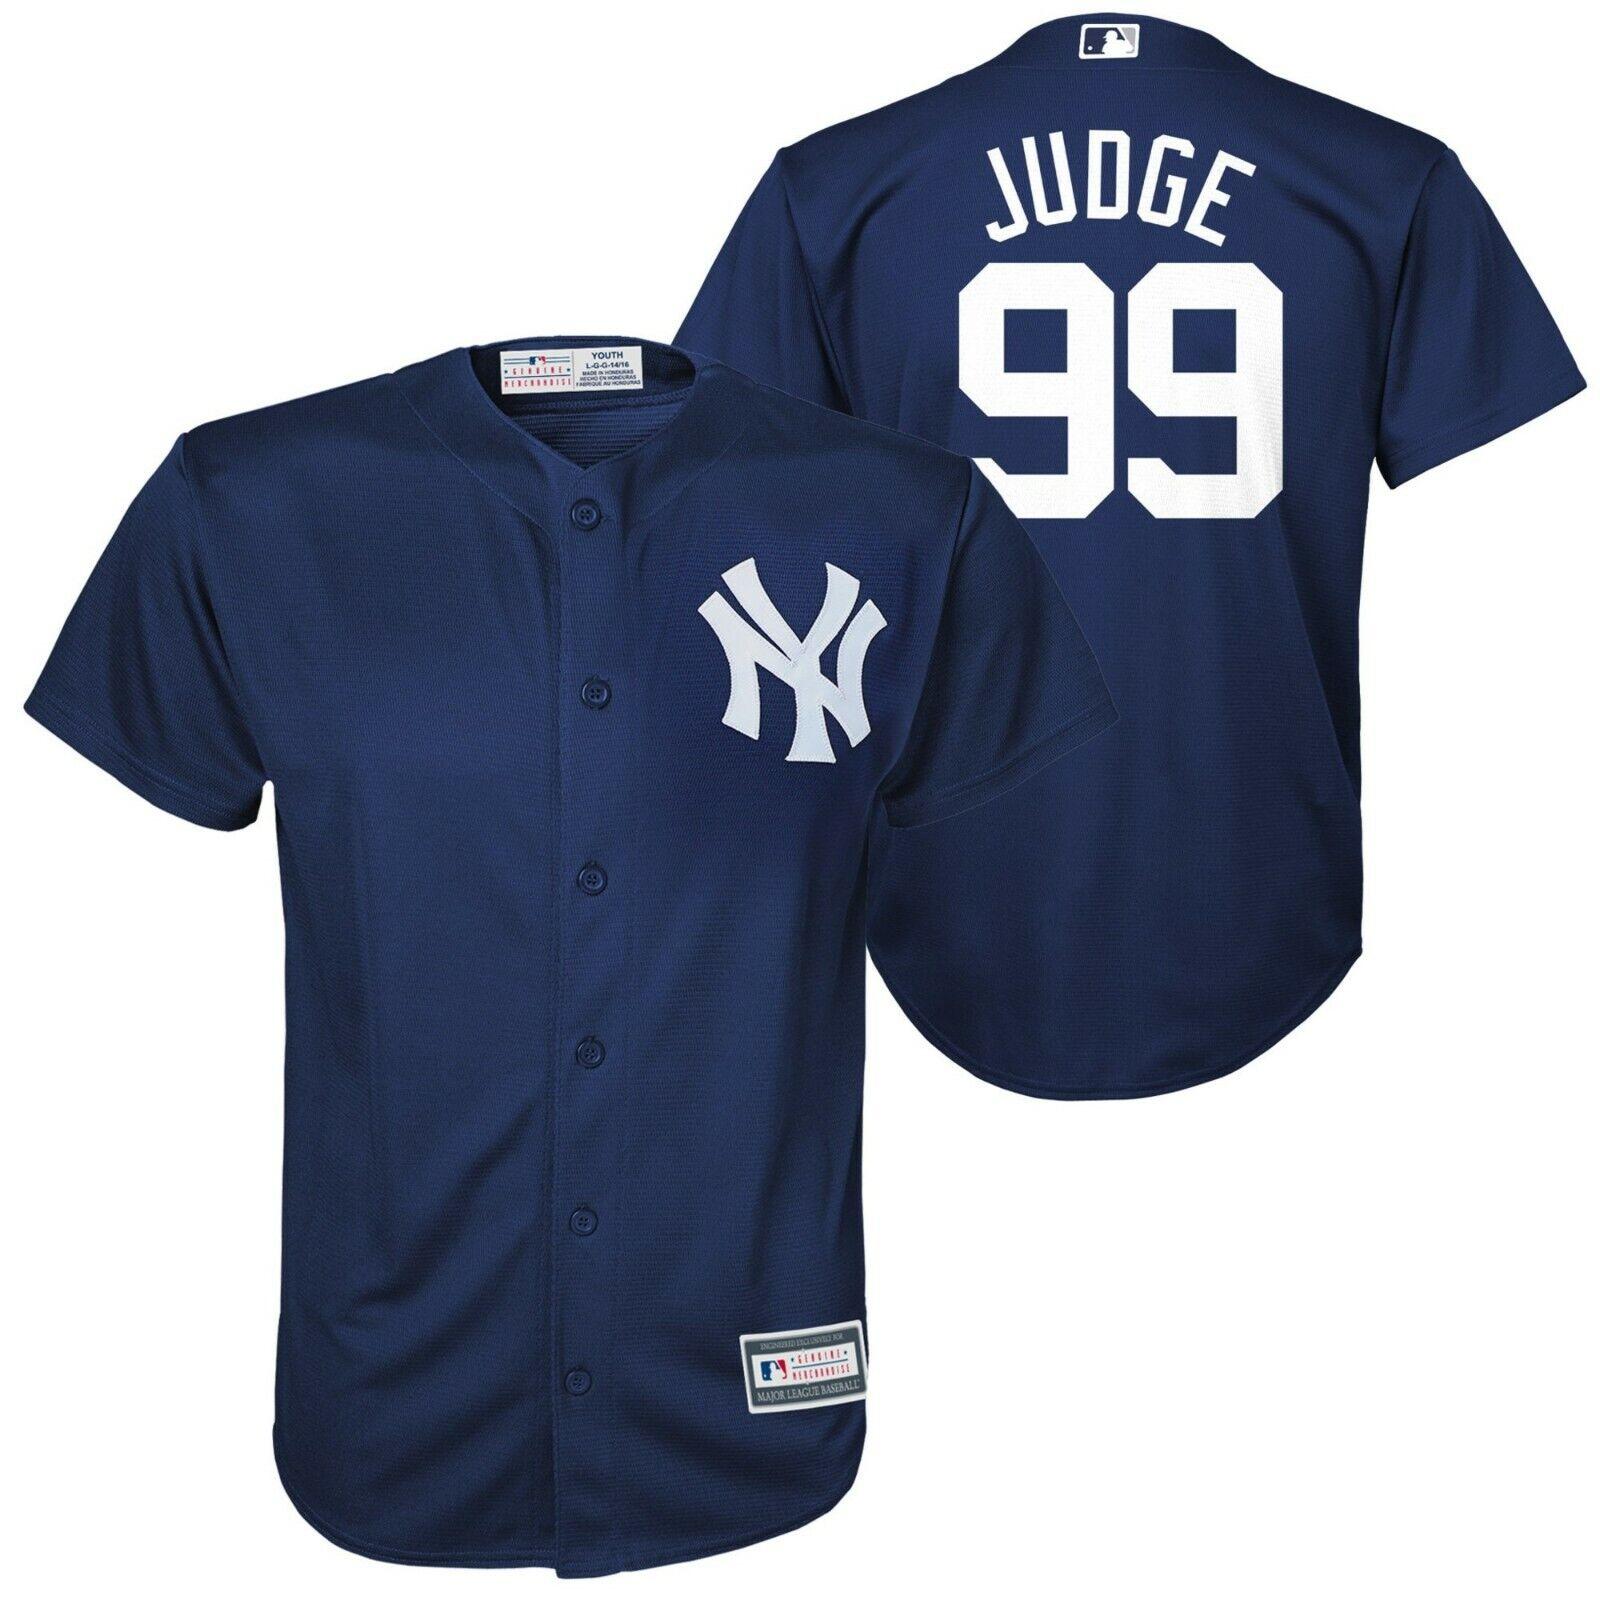 Aron Richter New York Yankees  99 Jugendliche Majestic Majestic Majestic Cool Base Trikot Eu S M L 2d37be